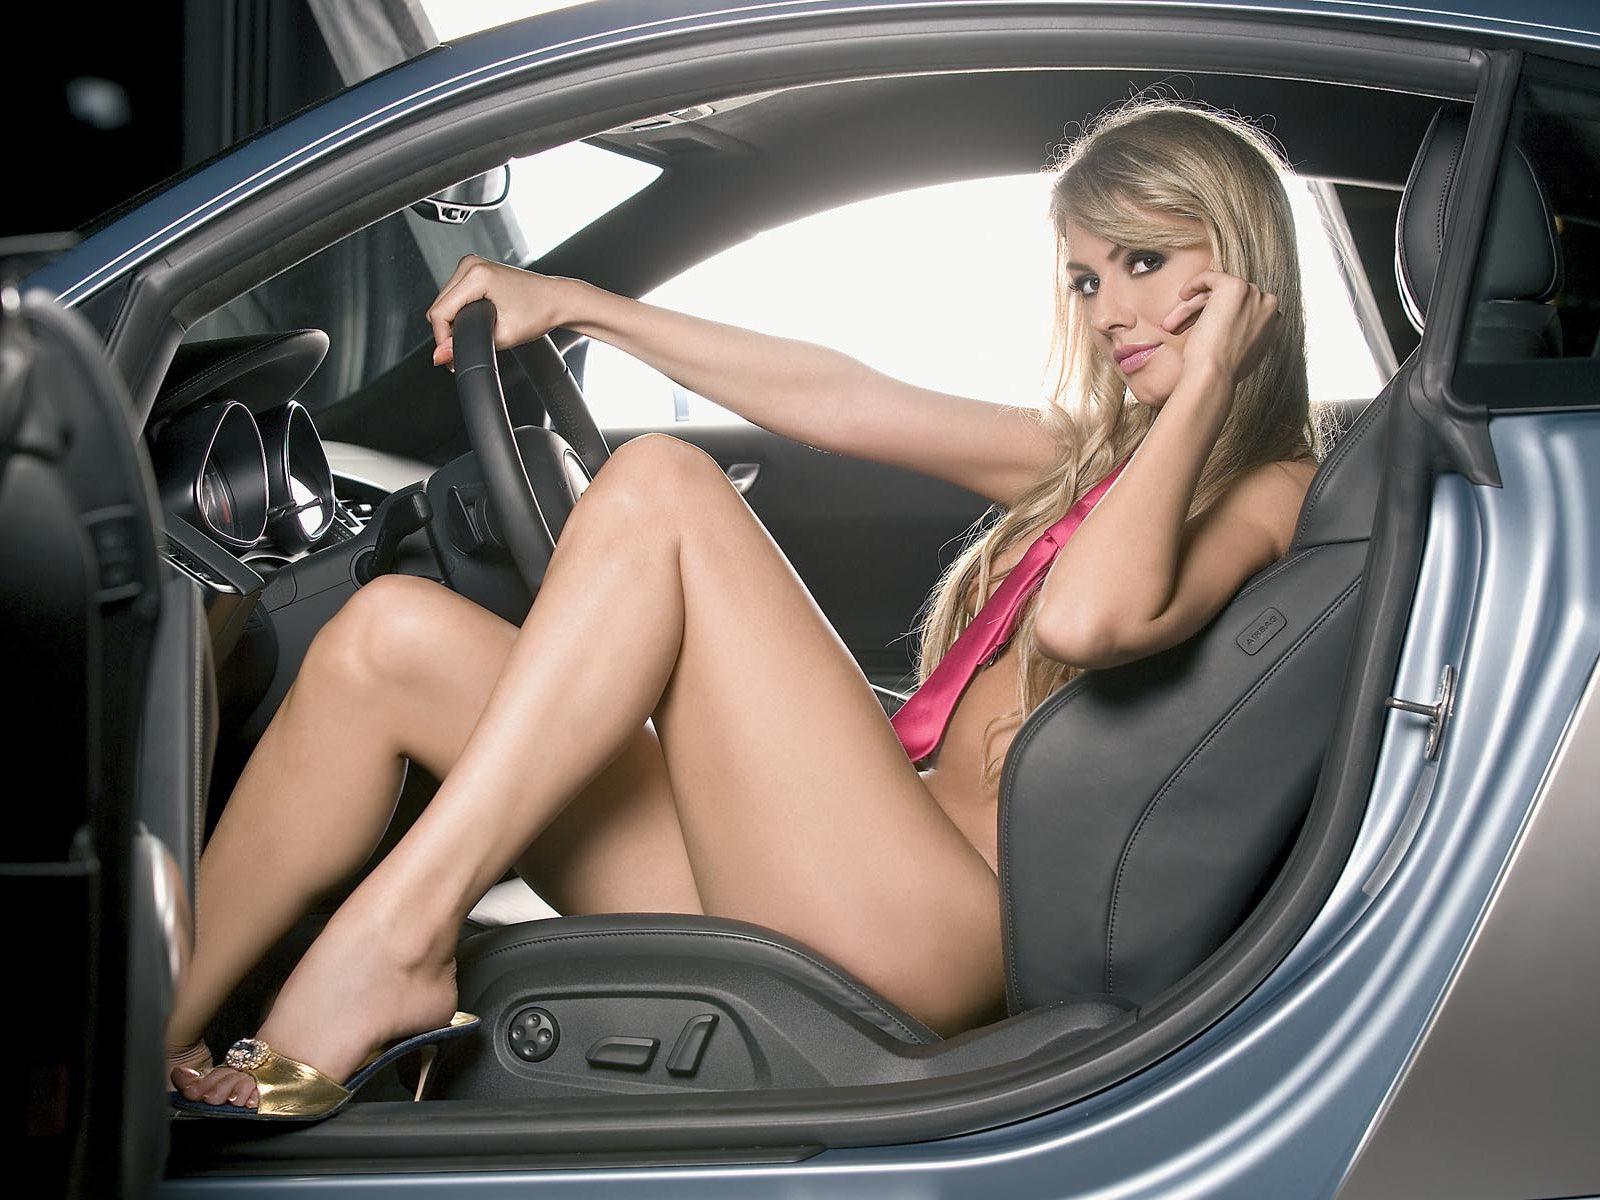 Auto mall nude